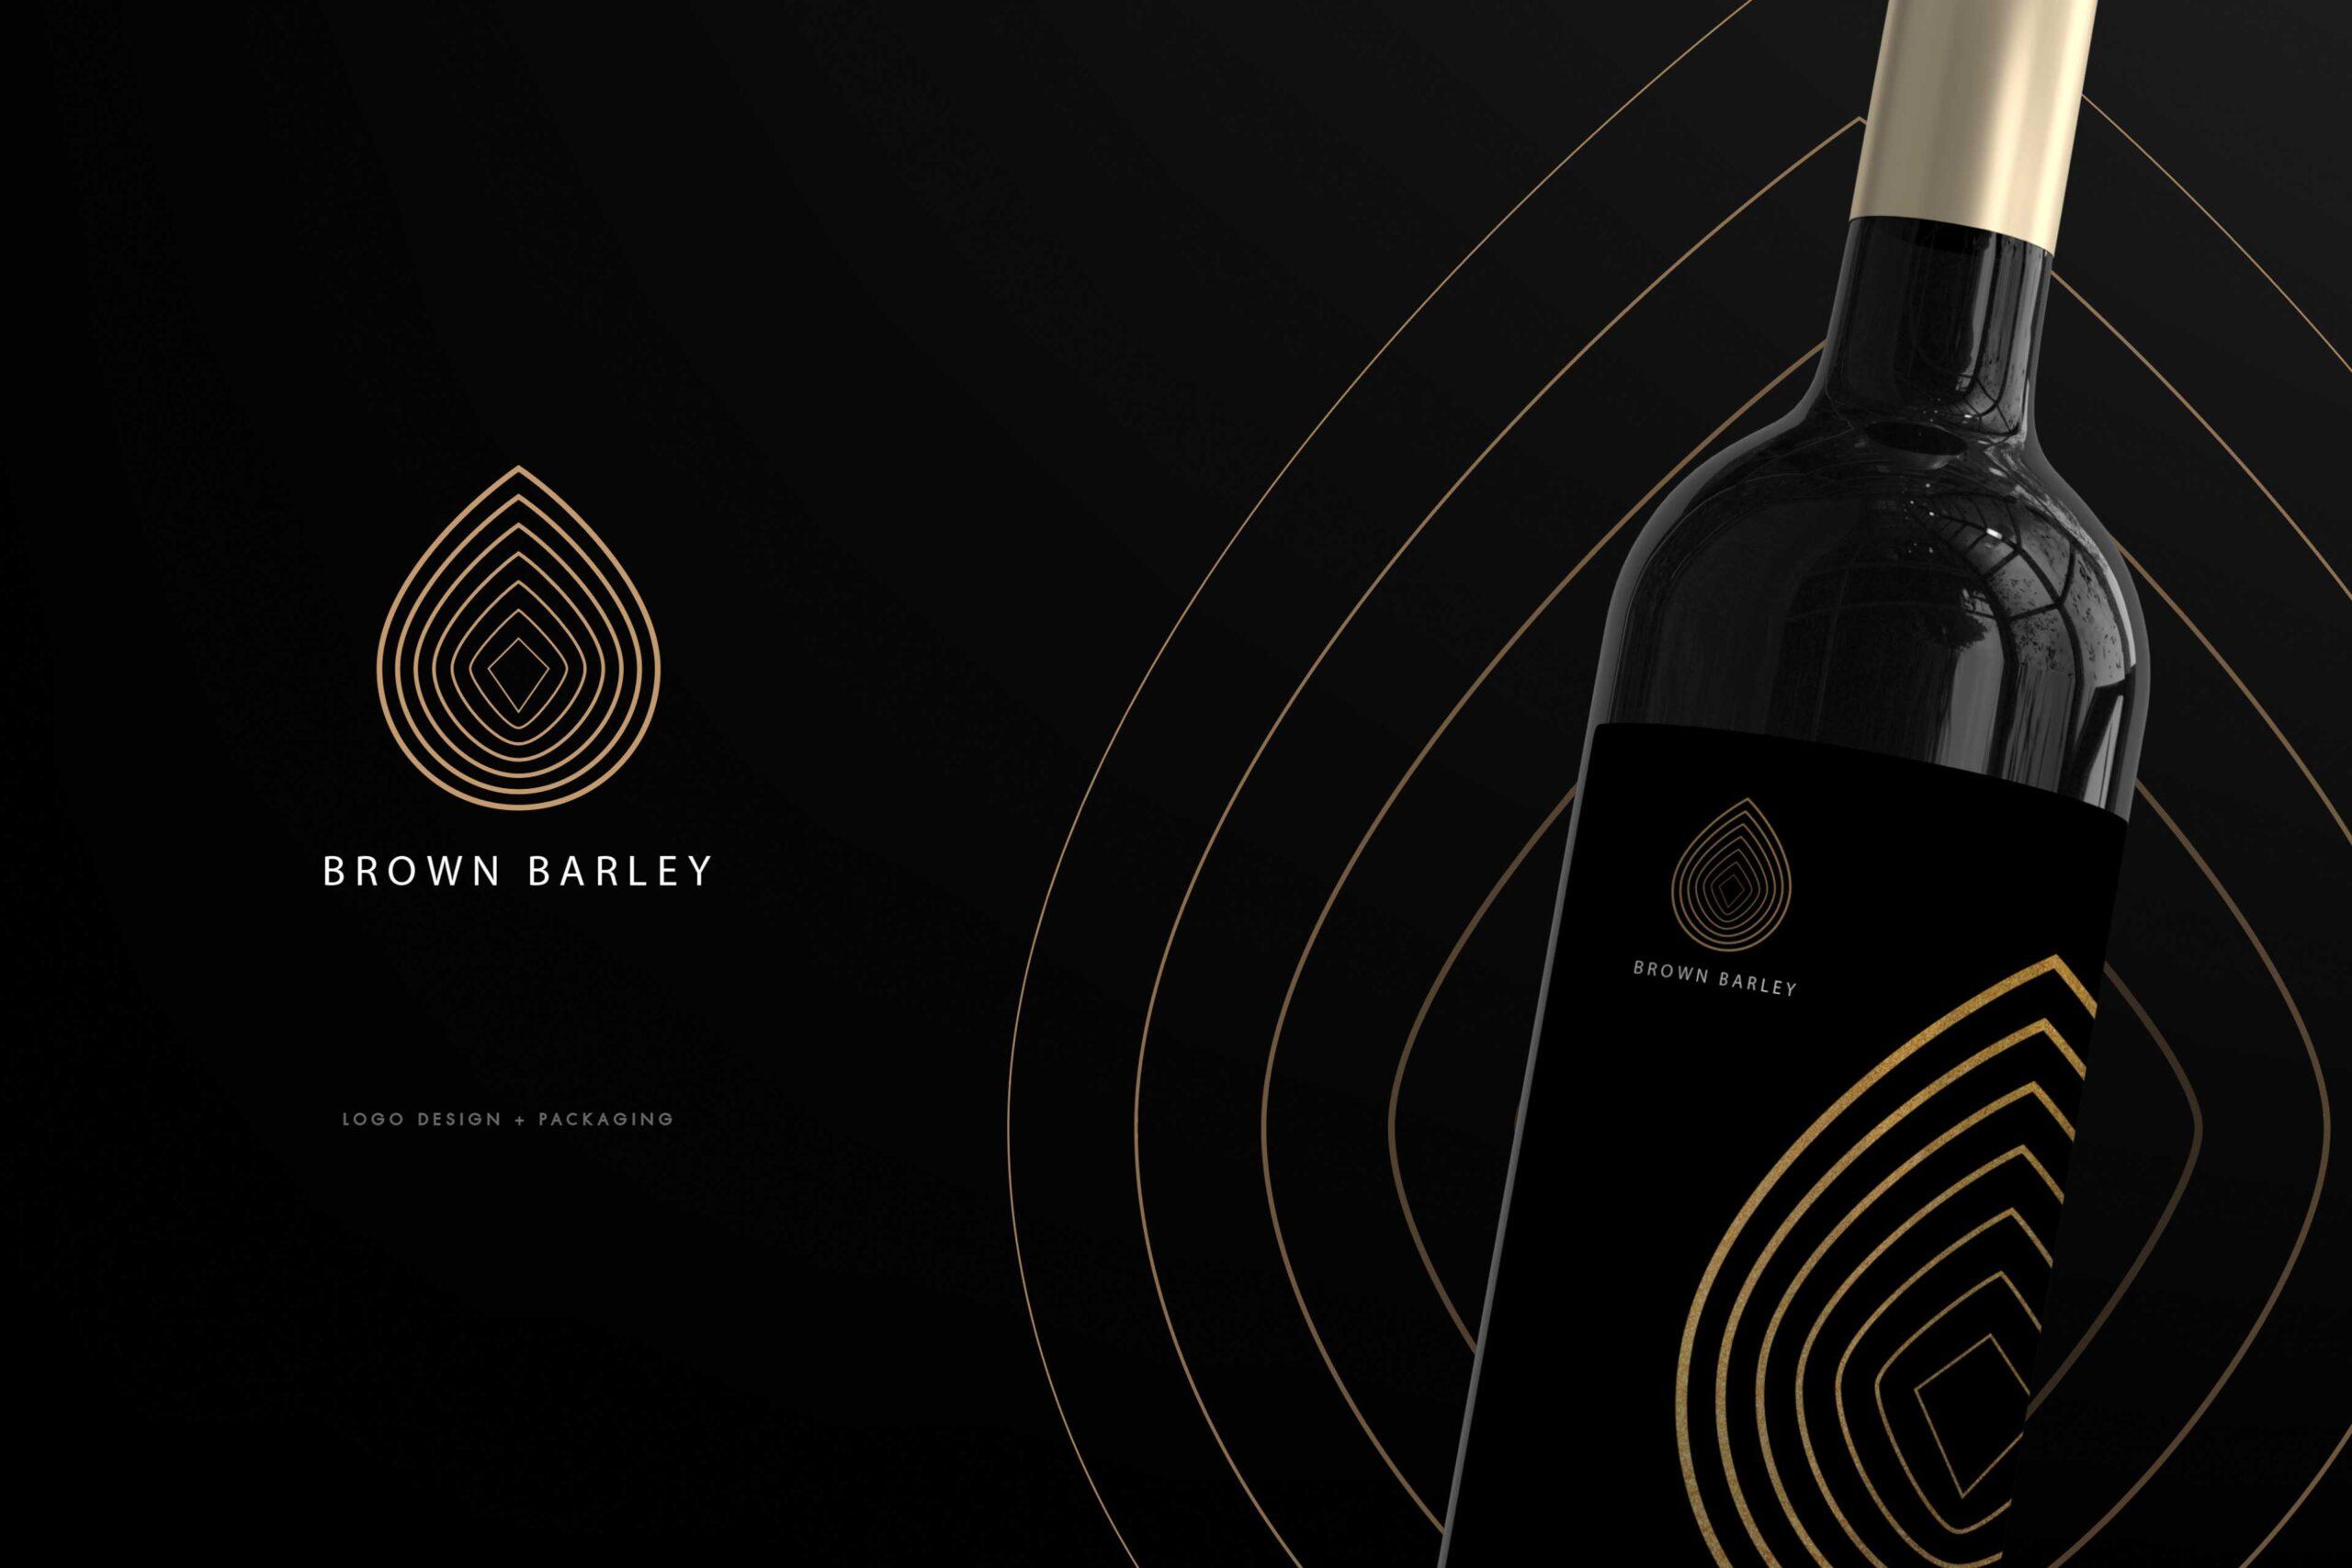 Packaging-design01